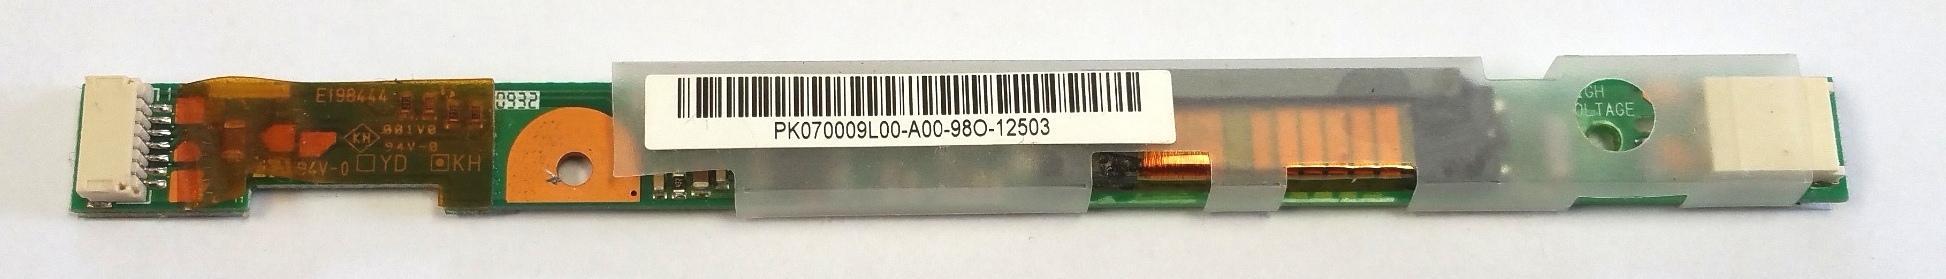 Invertor PK070009L00 z eMachines E627 KAWG0